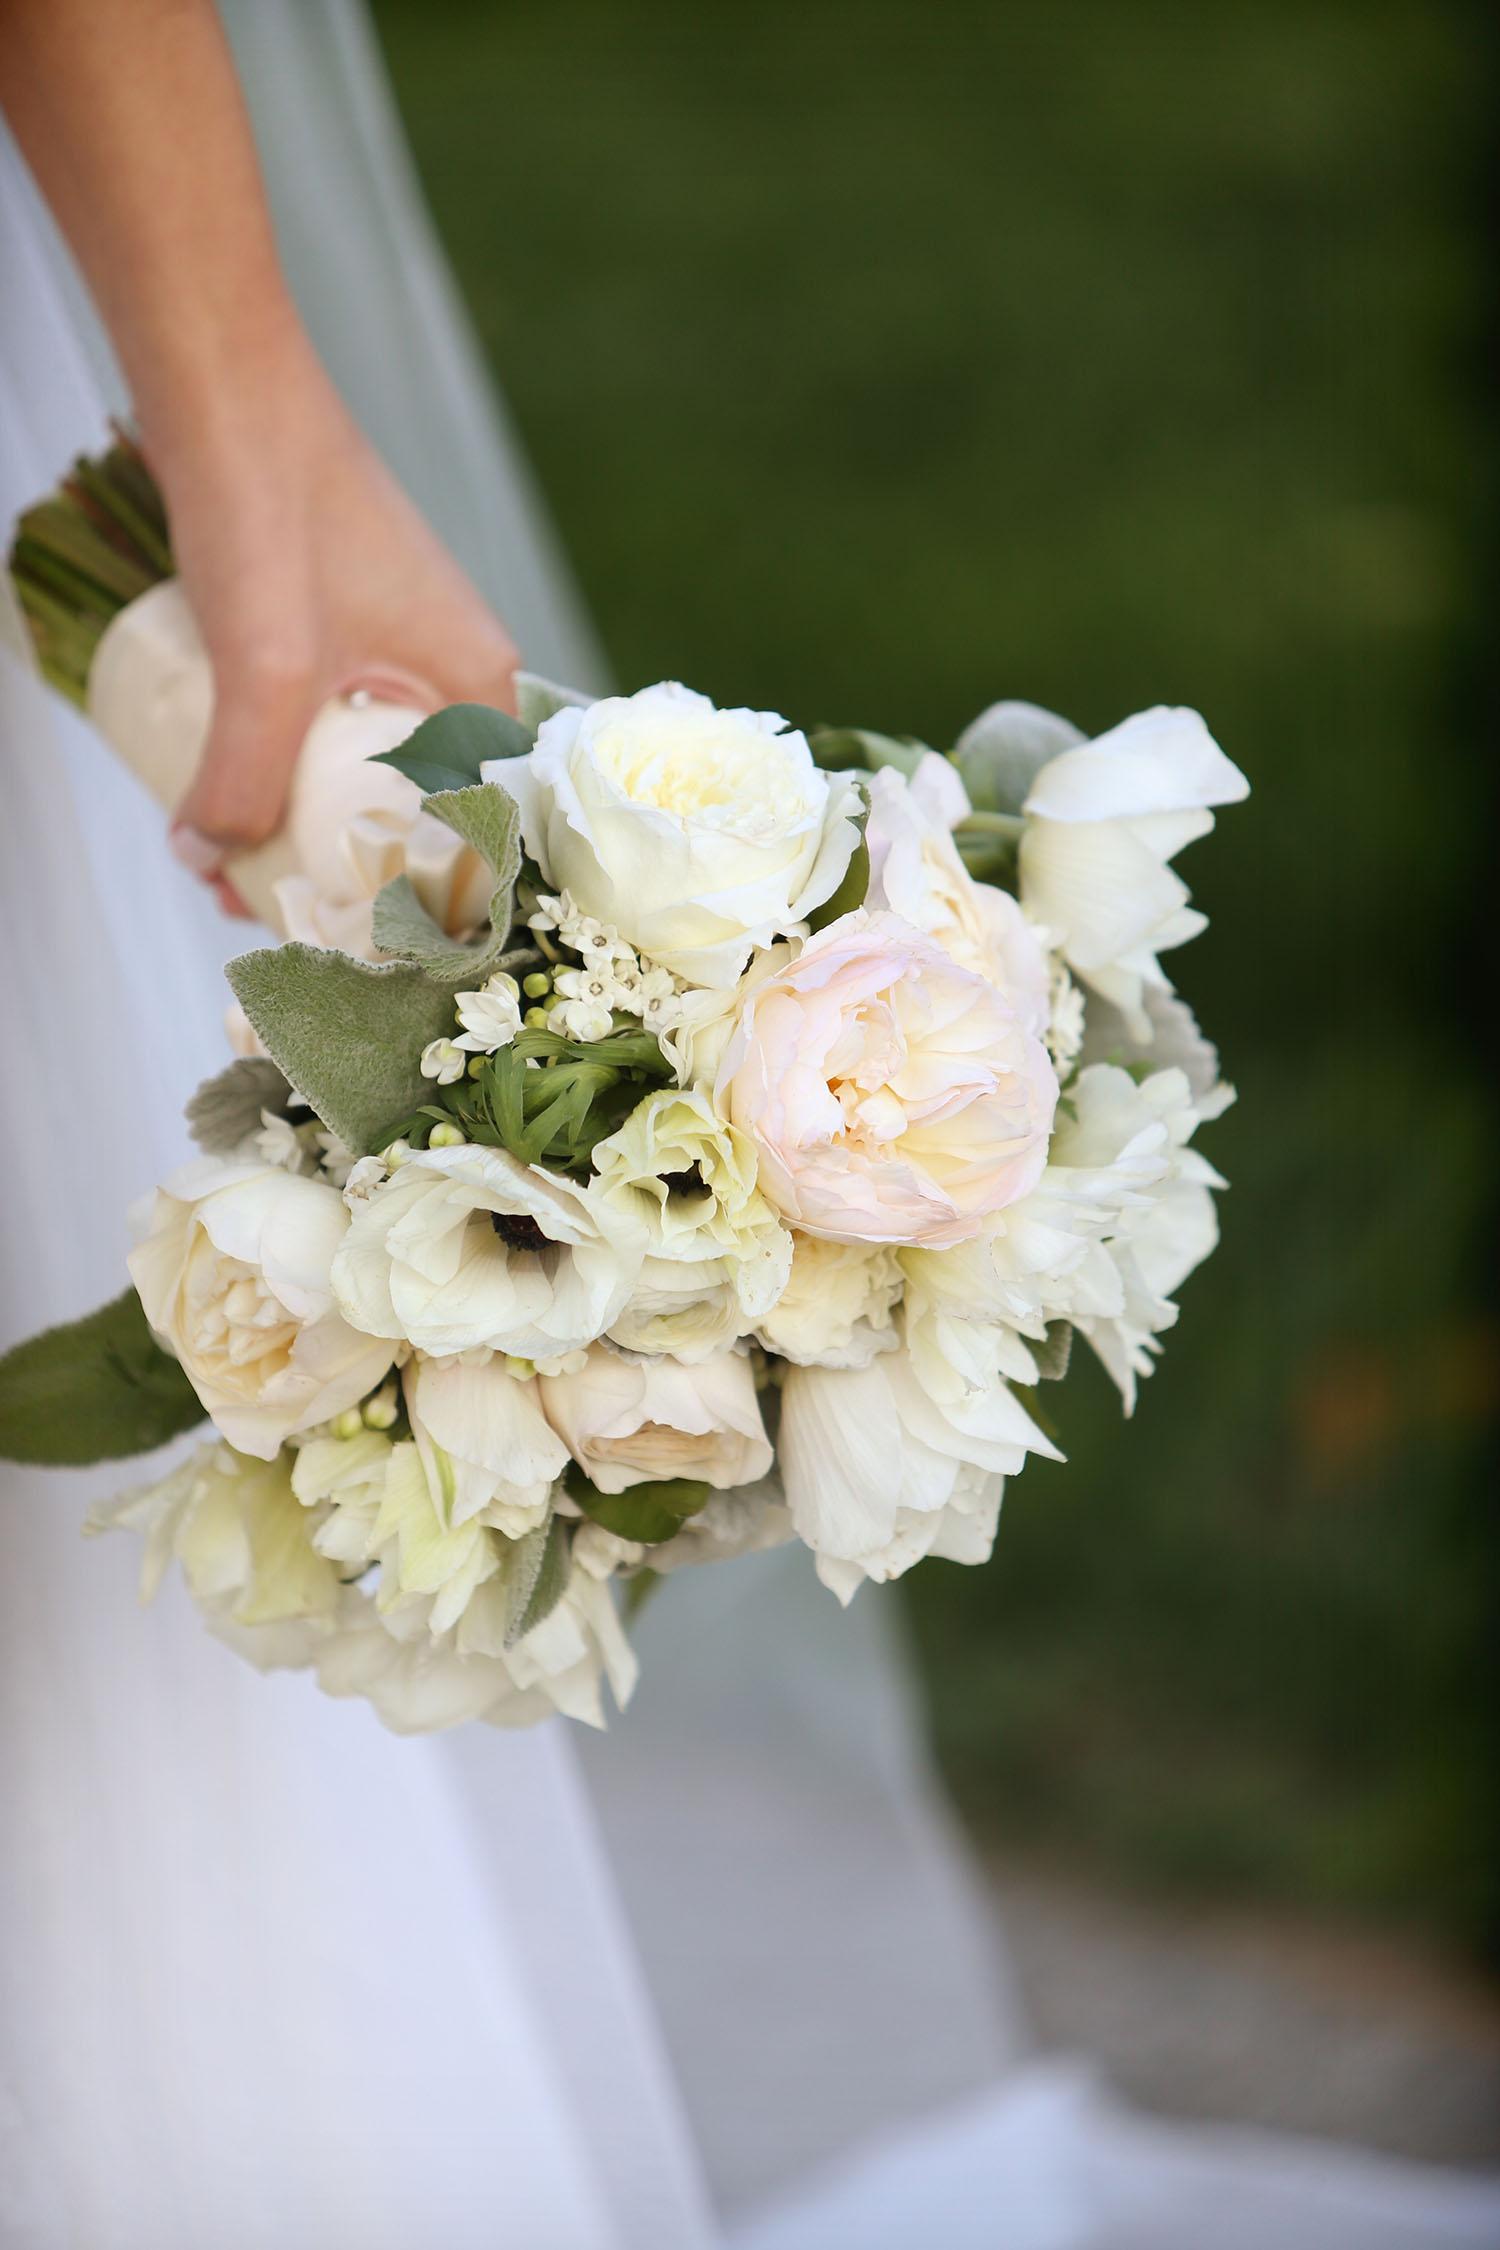 Alison Conklin Photography    Wedding Reception   GulphMills Golf Club, Kingof Prussia, PA